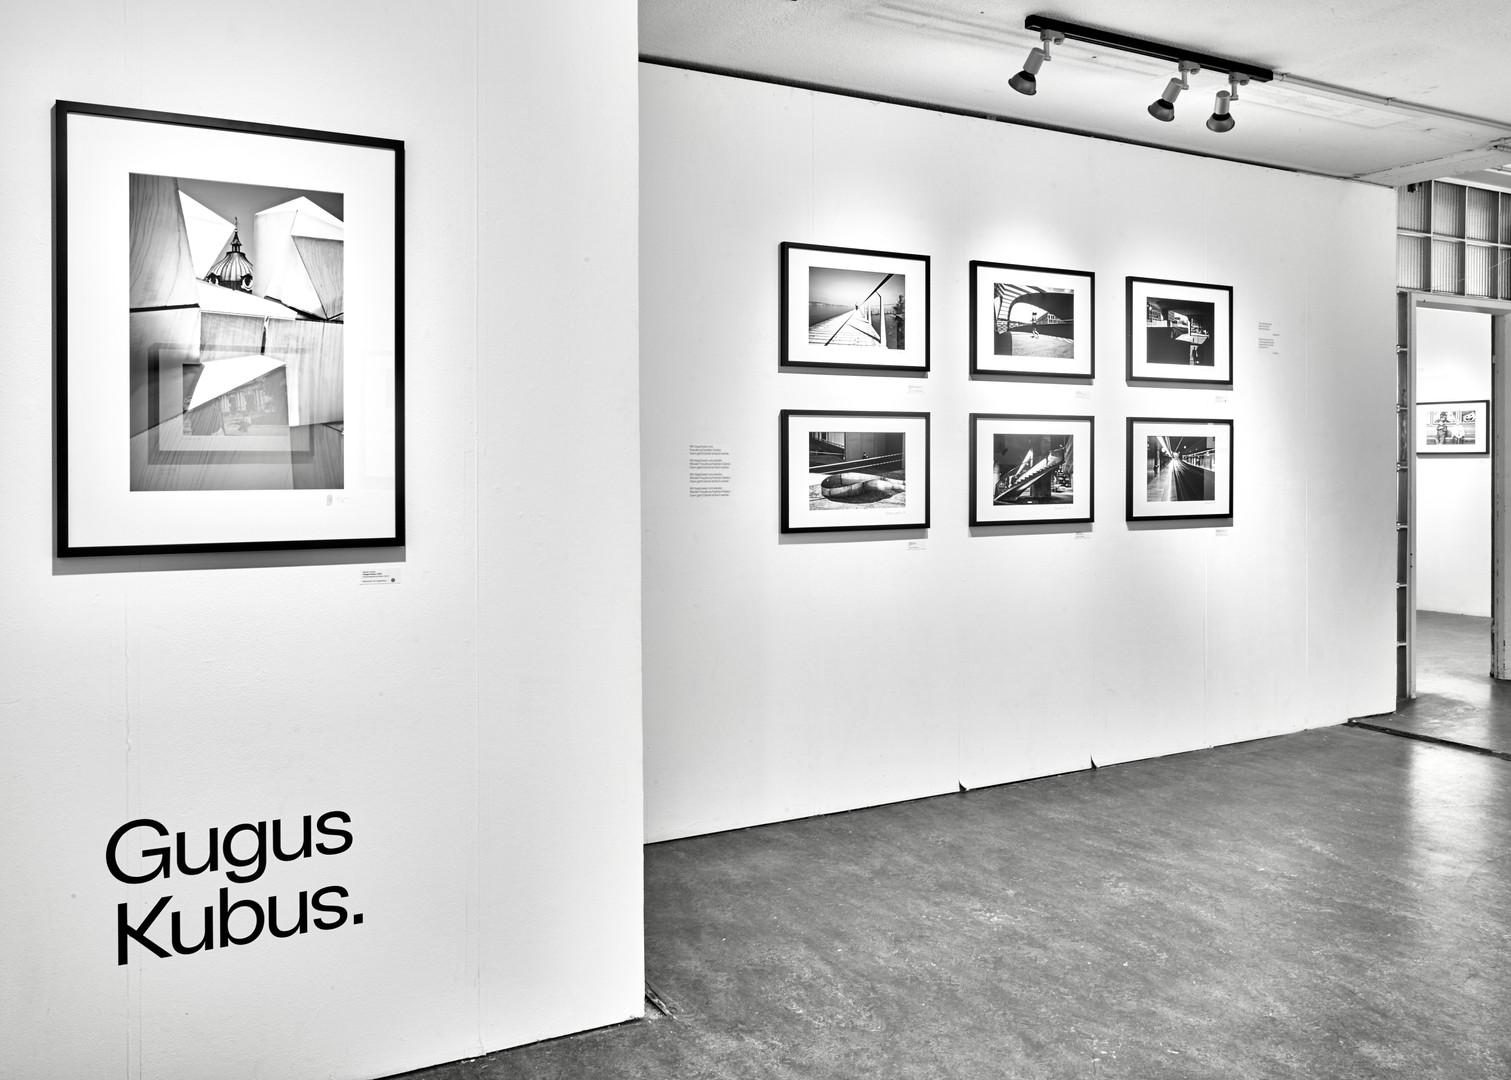 007_Ausstellung_20.jpg